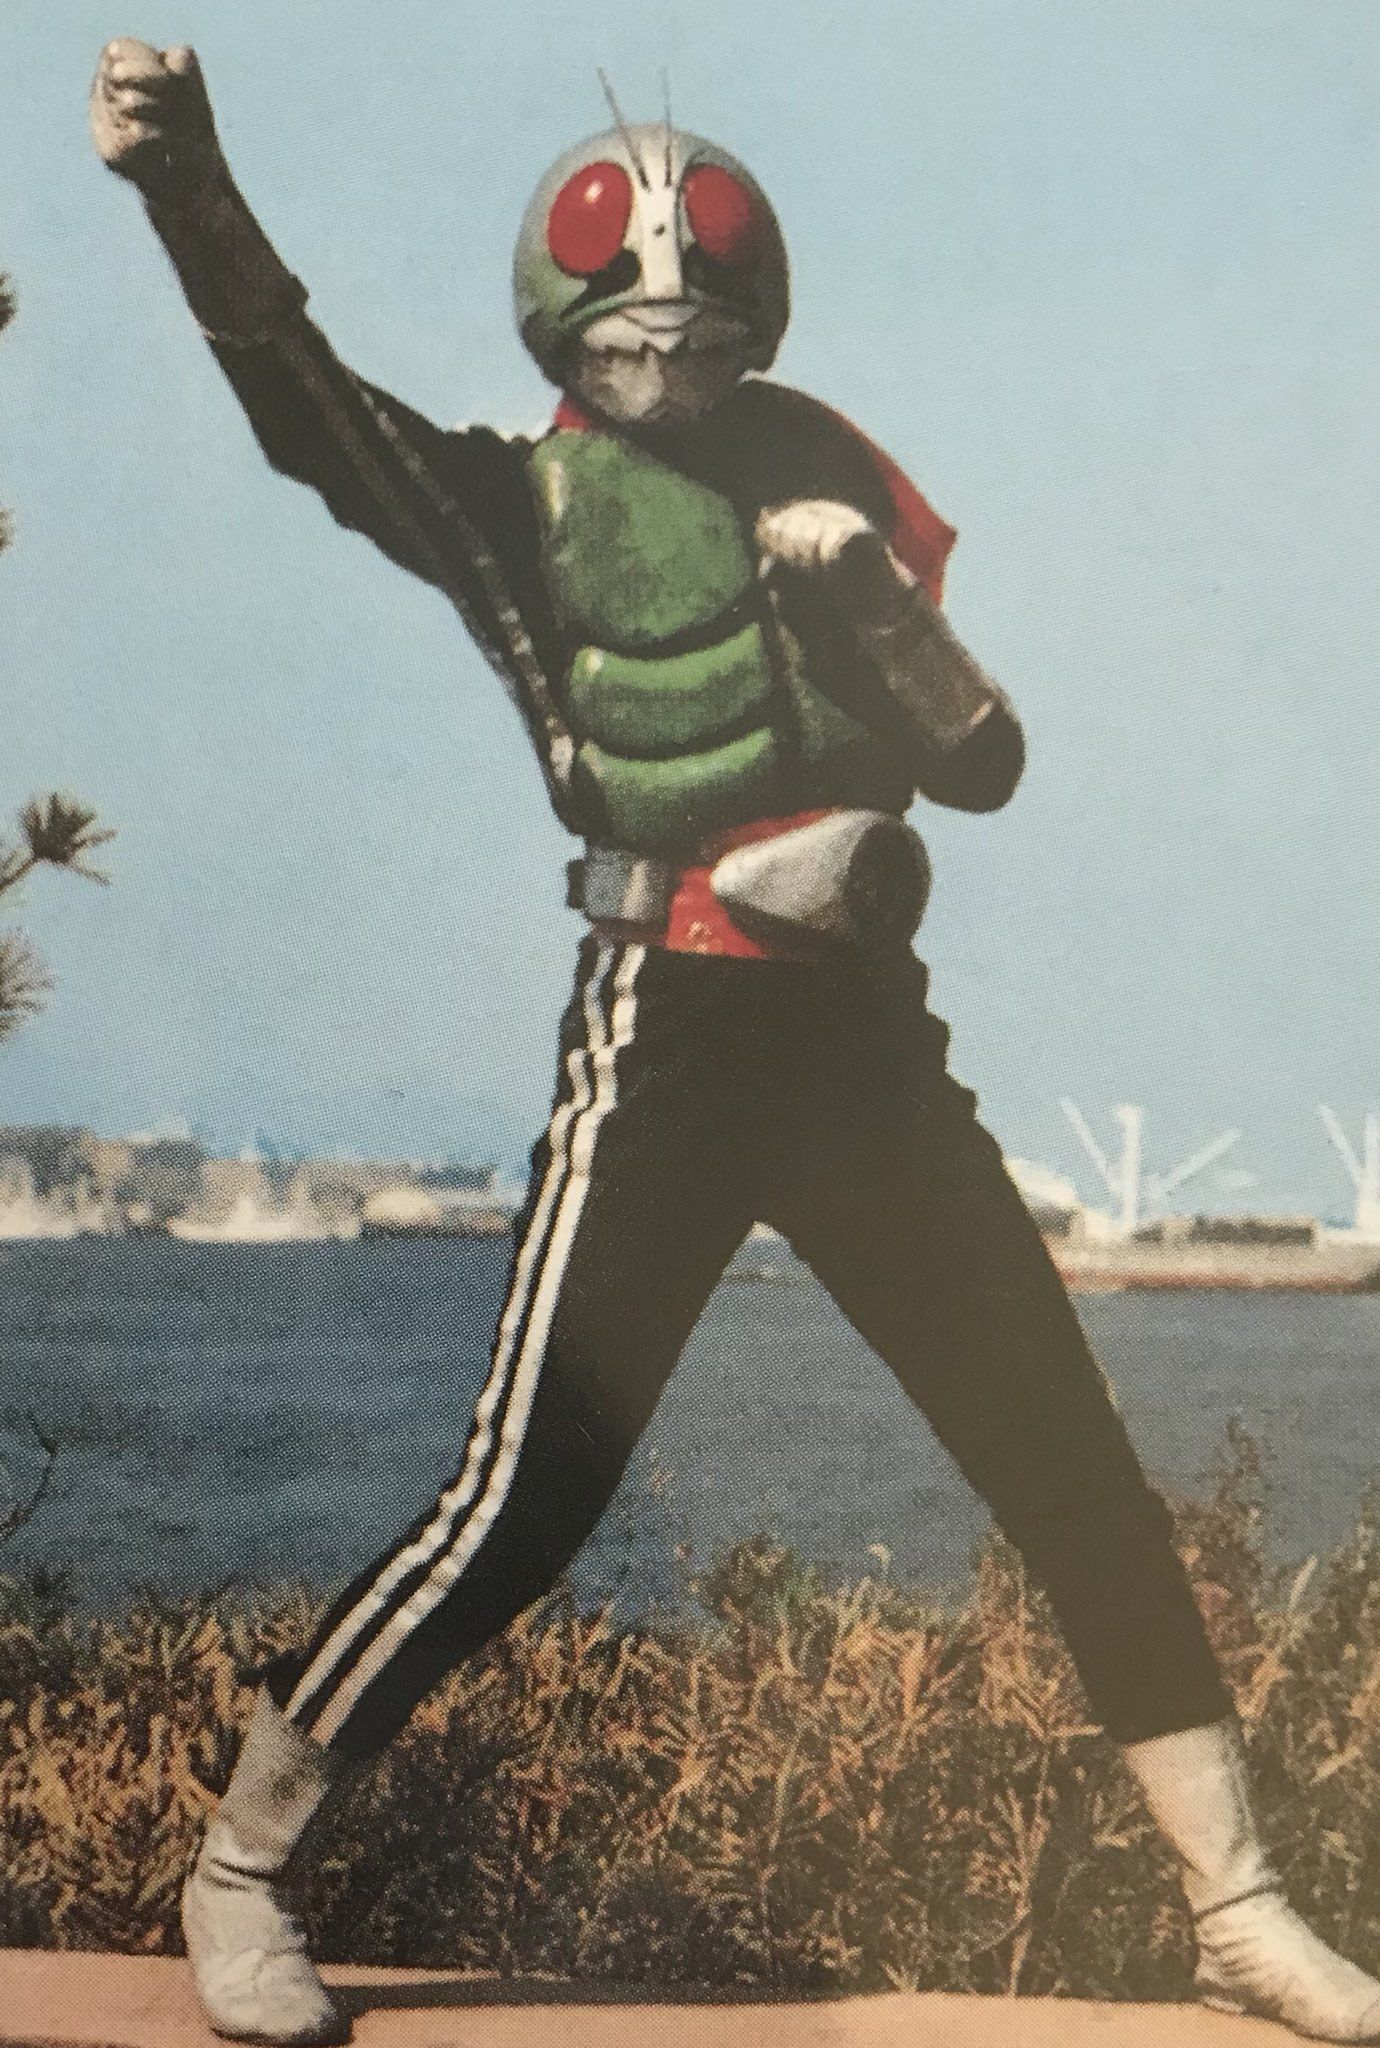 tokusatsu おしゃれまとめの人気アイデア pinterest luiz claudio 仮面ライダー1号 仮面ライダー ヒーロー